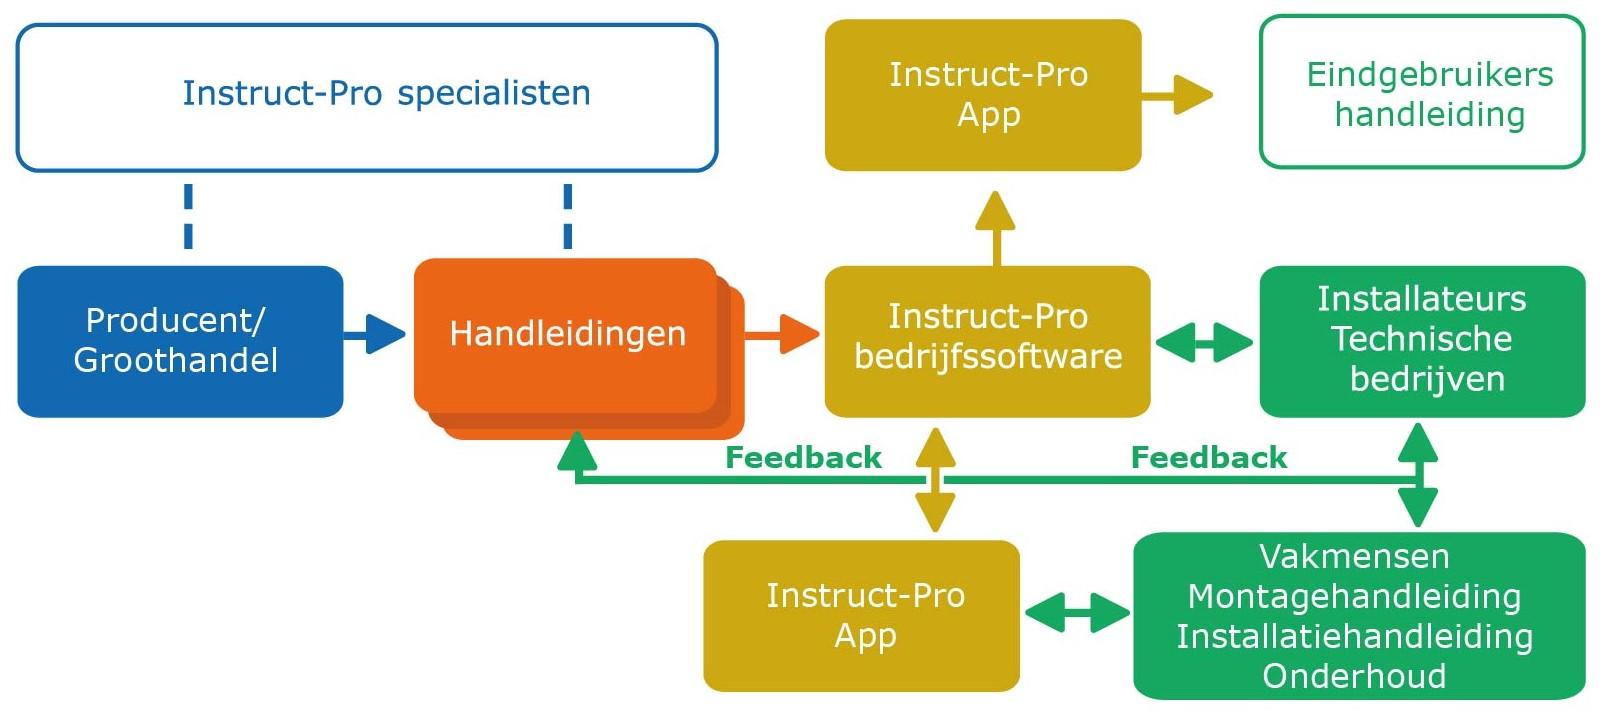 Stroomdiagram Instruct-Pro